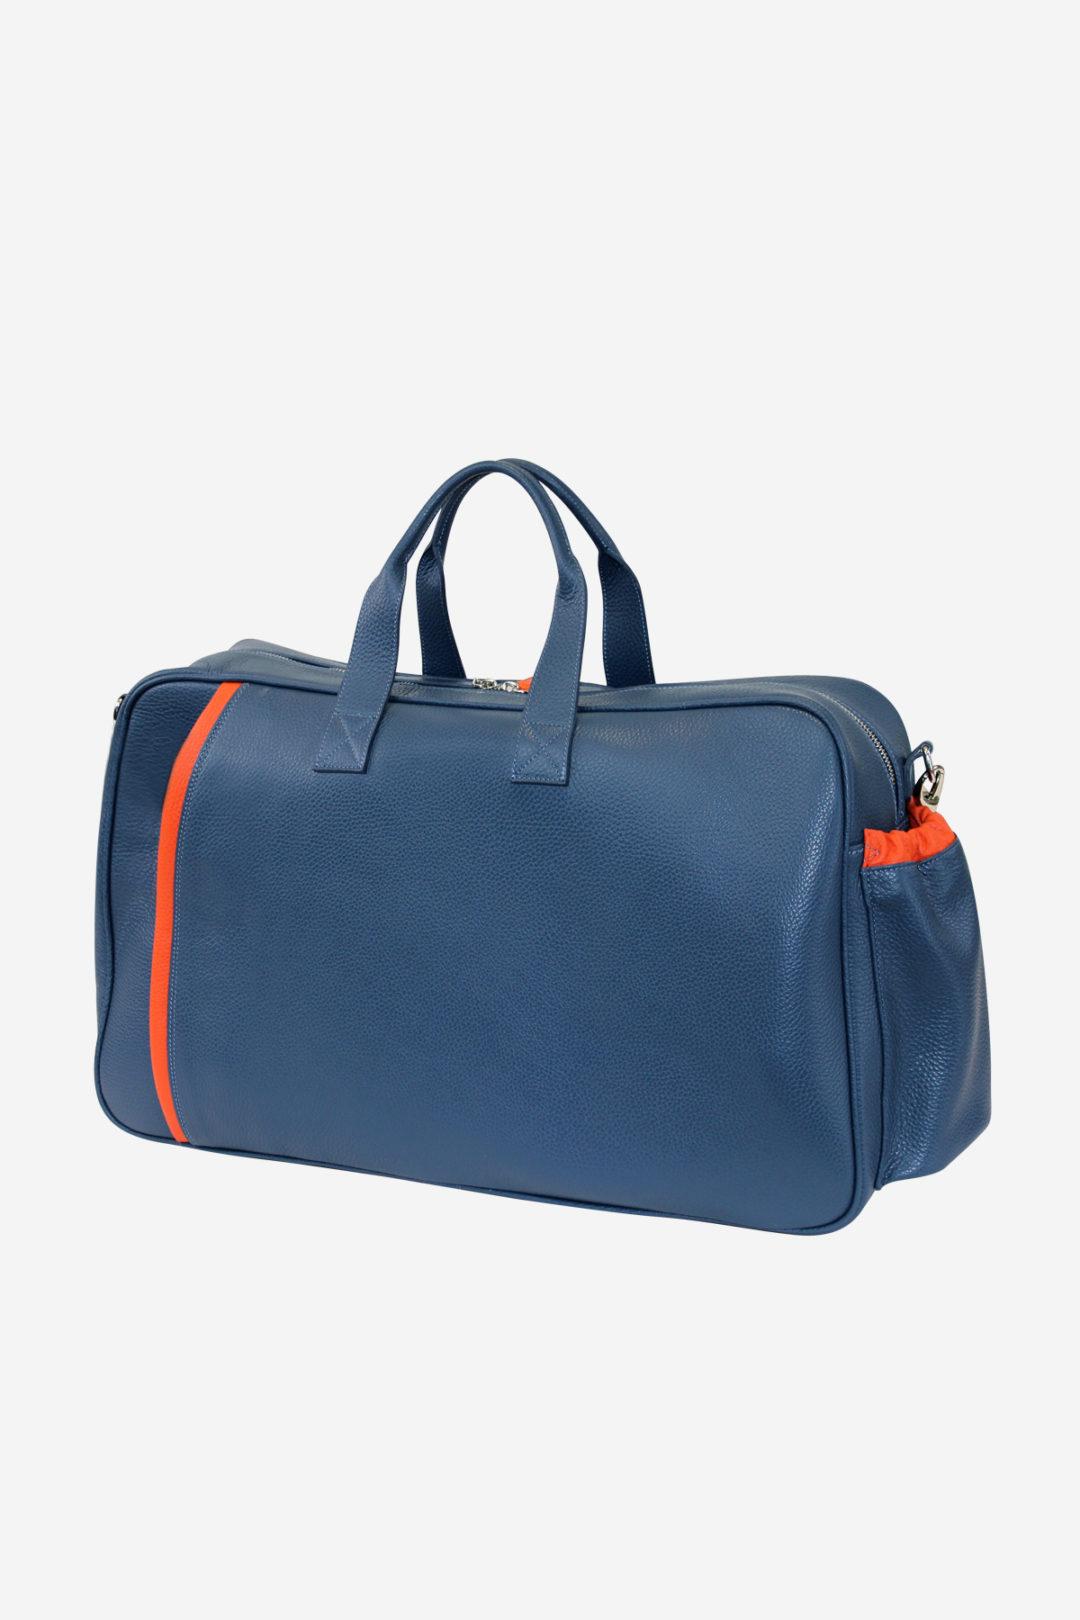 Lightning Sport Bag resistant waterproof leather madeinitaly